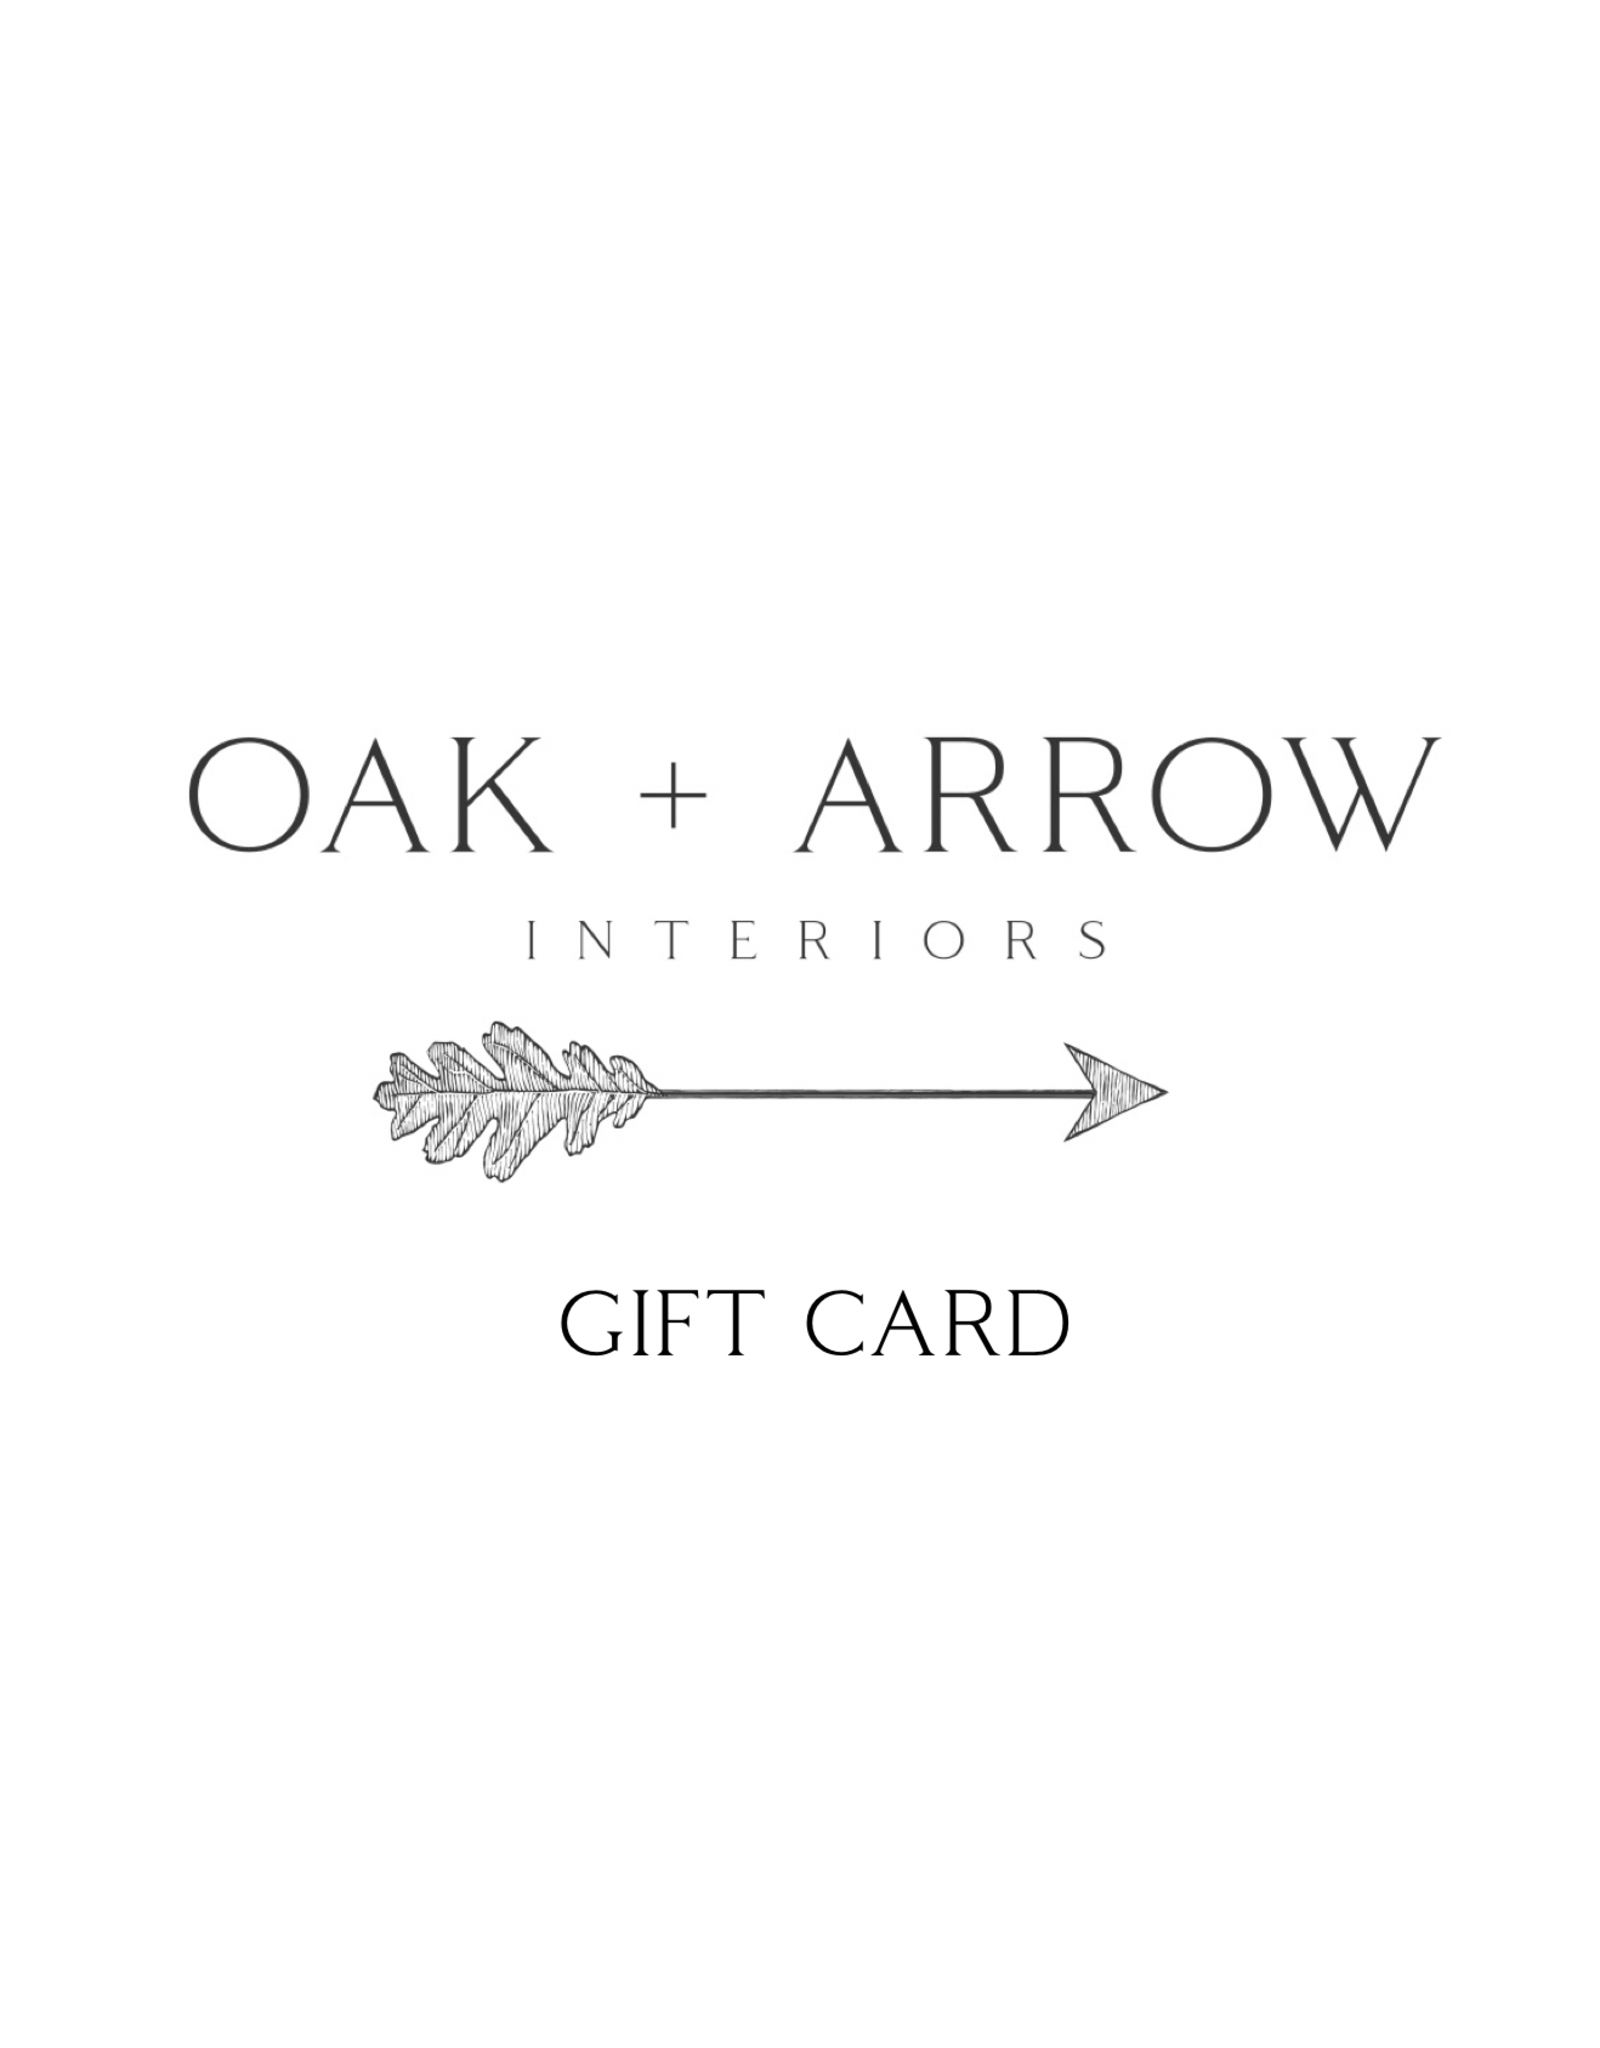 Oak + Arrow Interiors Gift Card $100